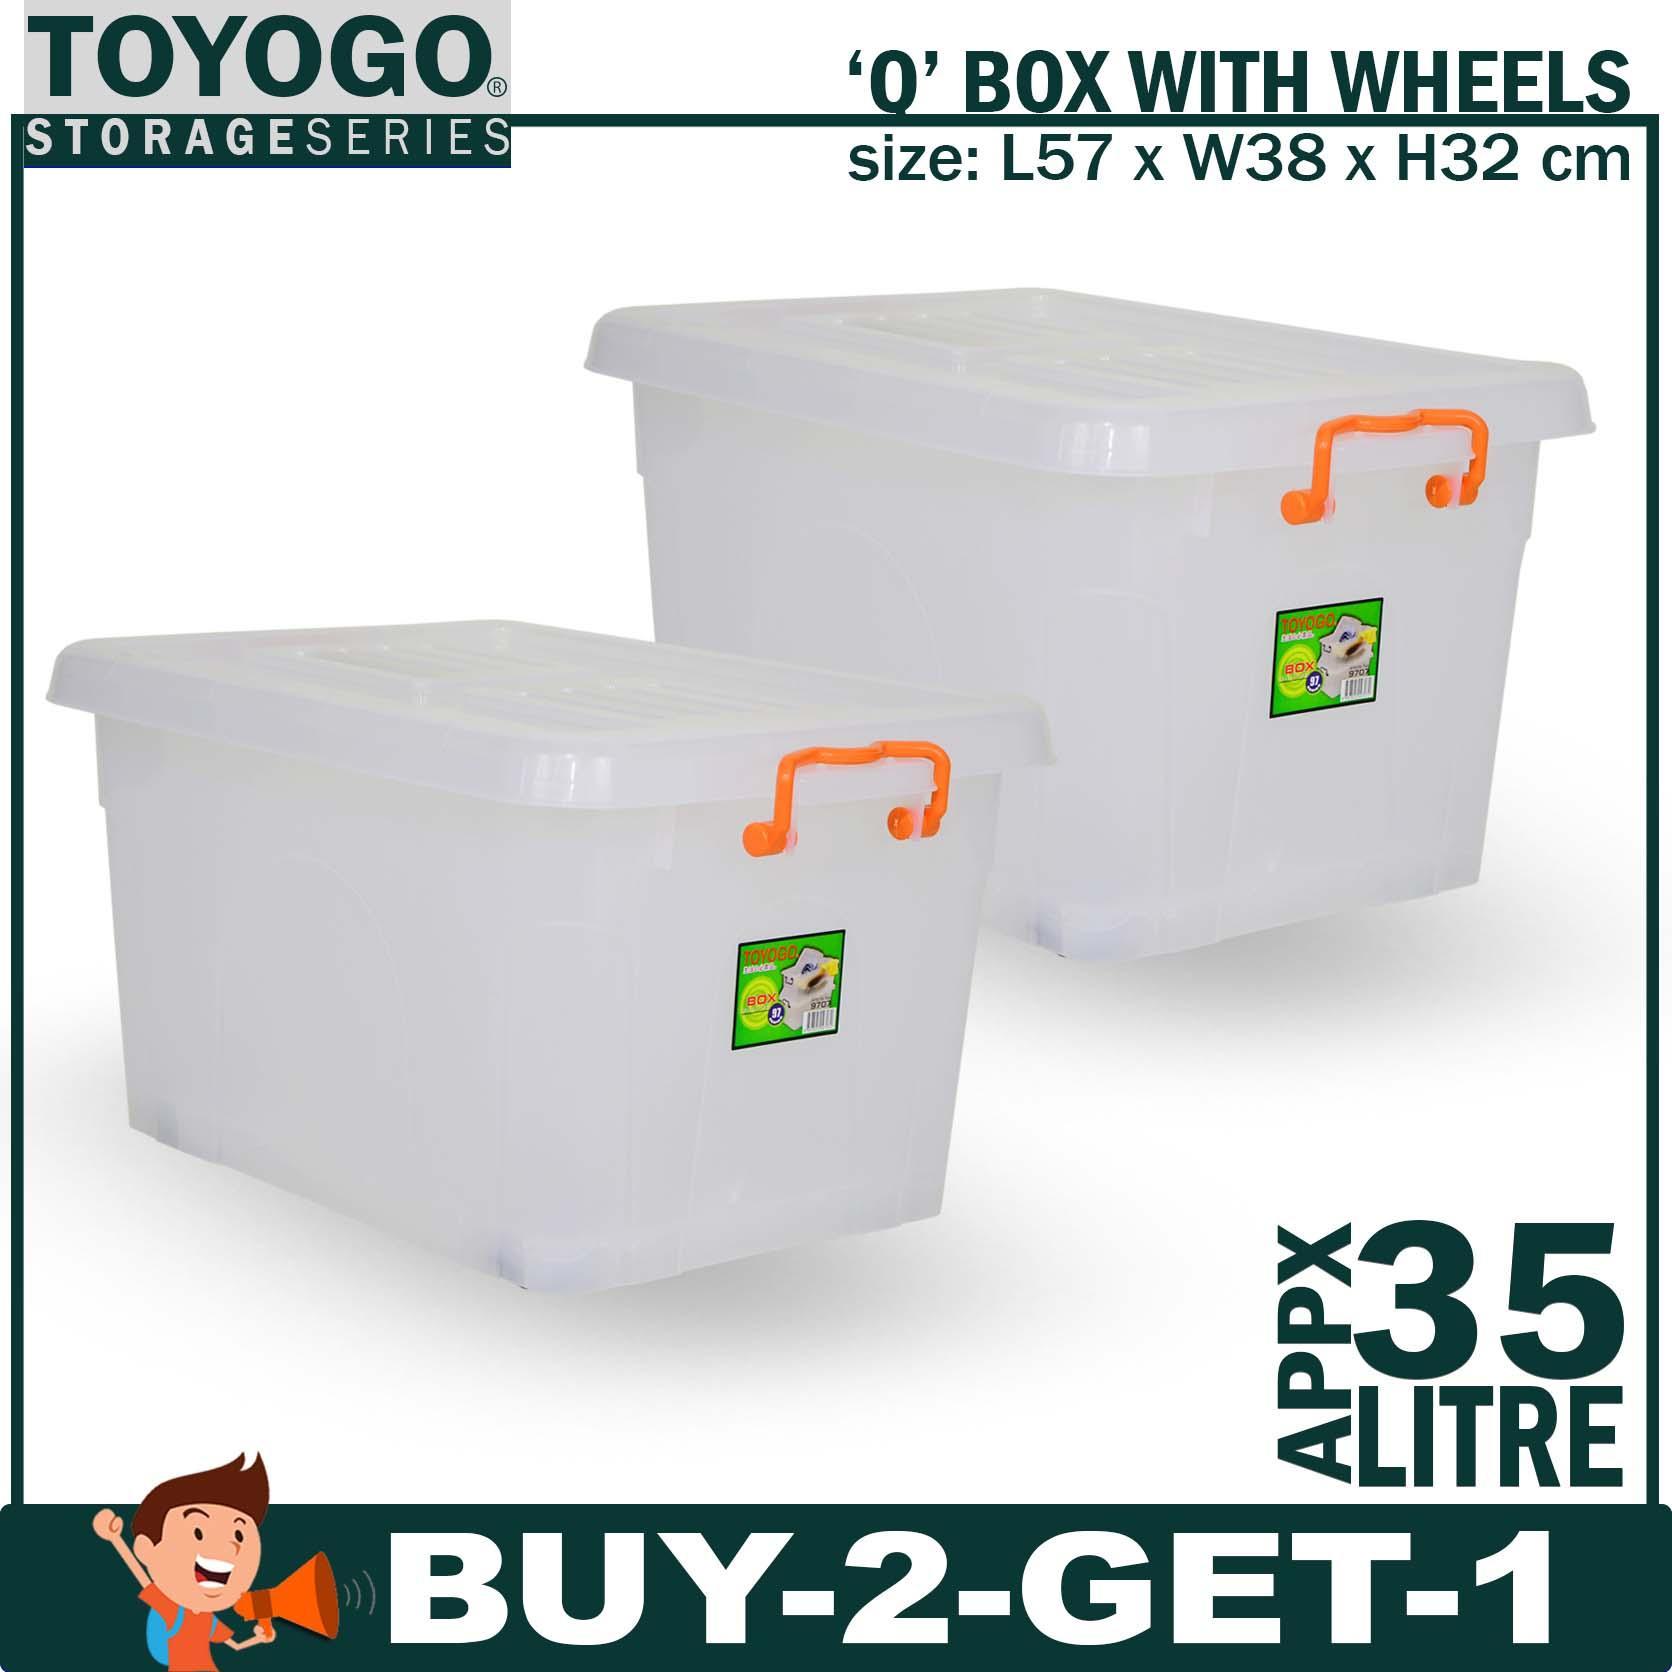 *BUY-2-GET-1 w/ FREE GIFT* [9707]TOYOGO - STORAGE BOX WITH WHEELS (HOUSEHOLD STORAGE)